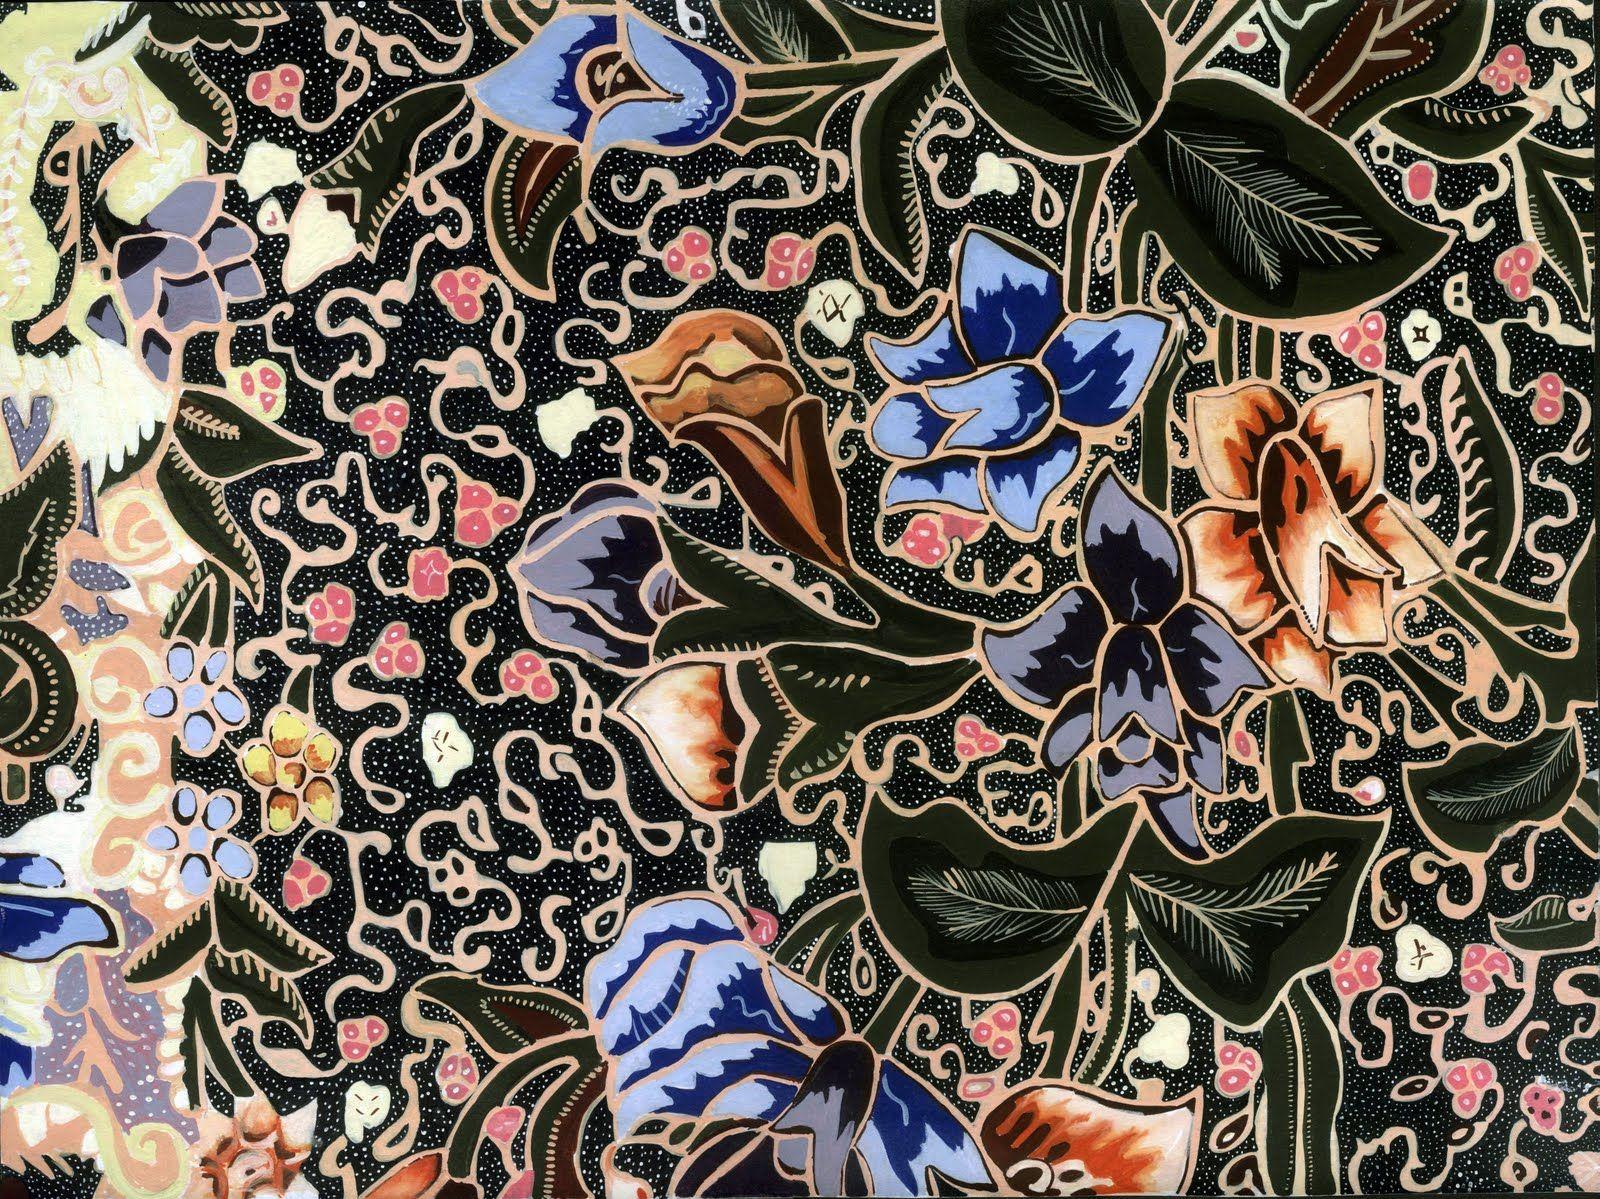 Batik Motif From Pekalongan Central Jawa Indonesian Art Design